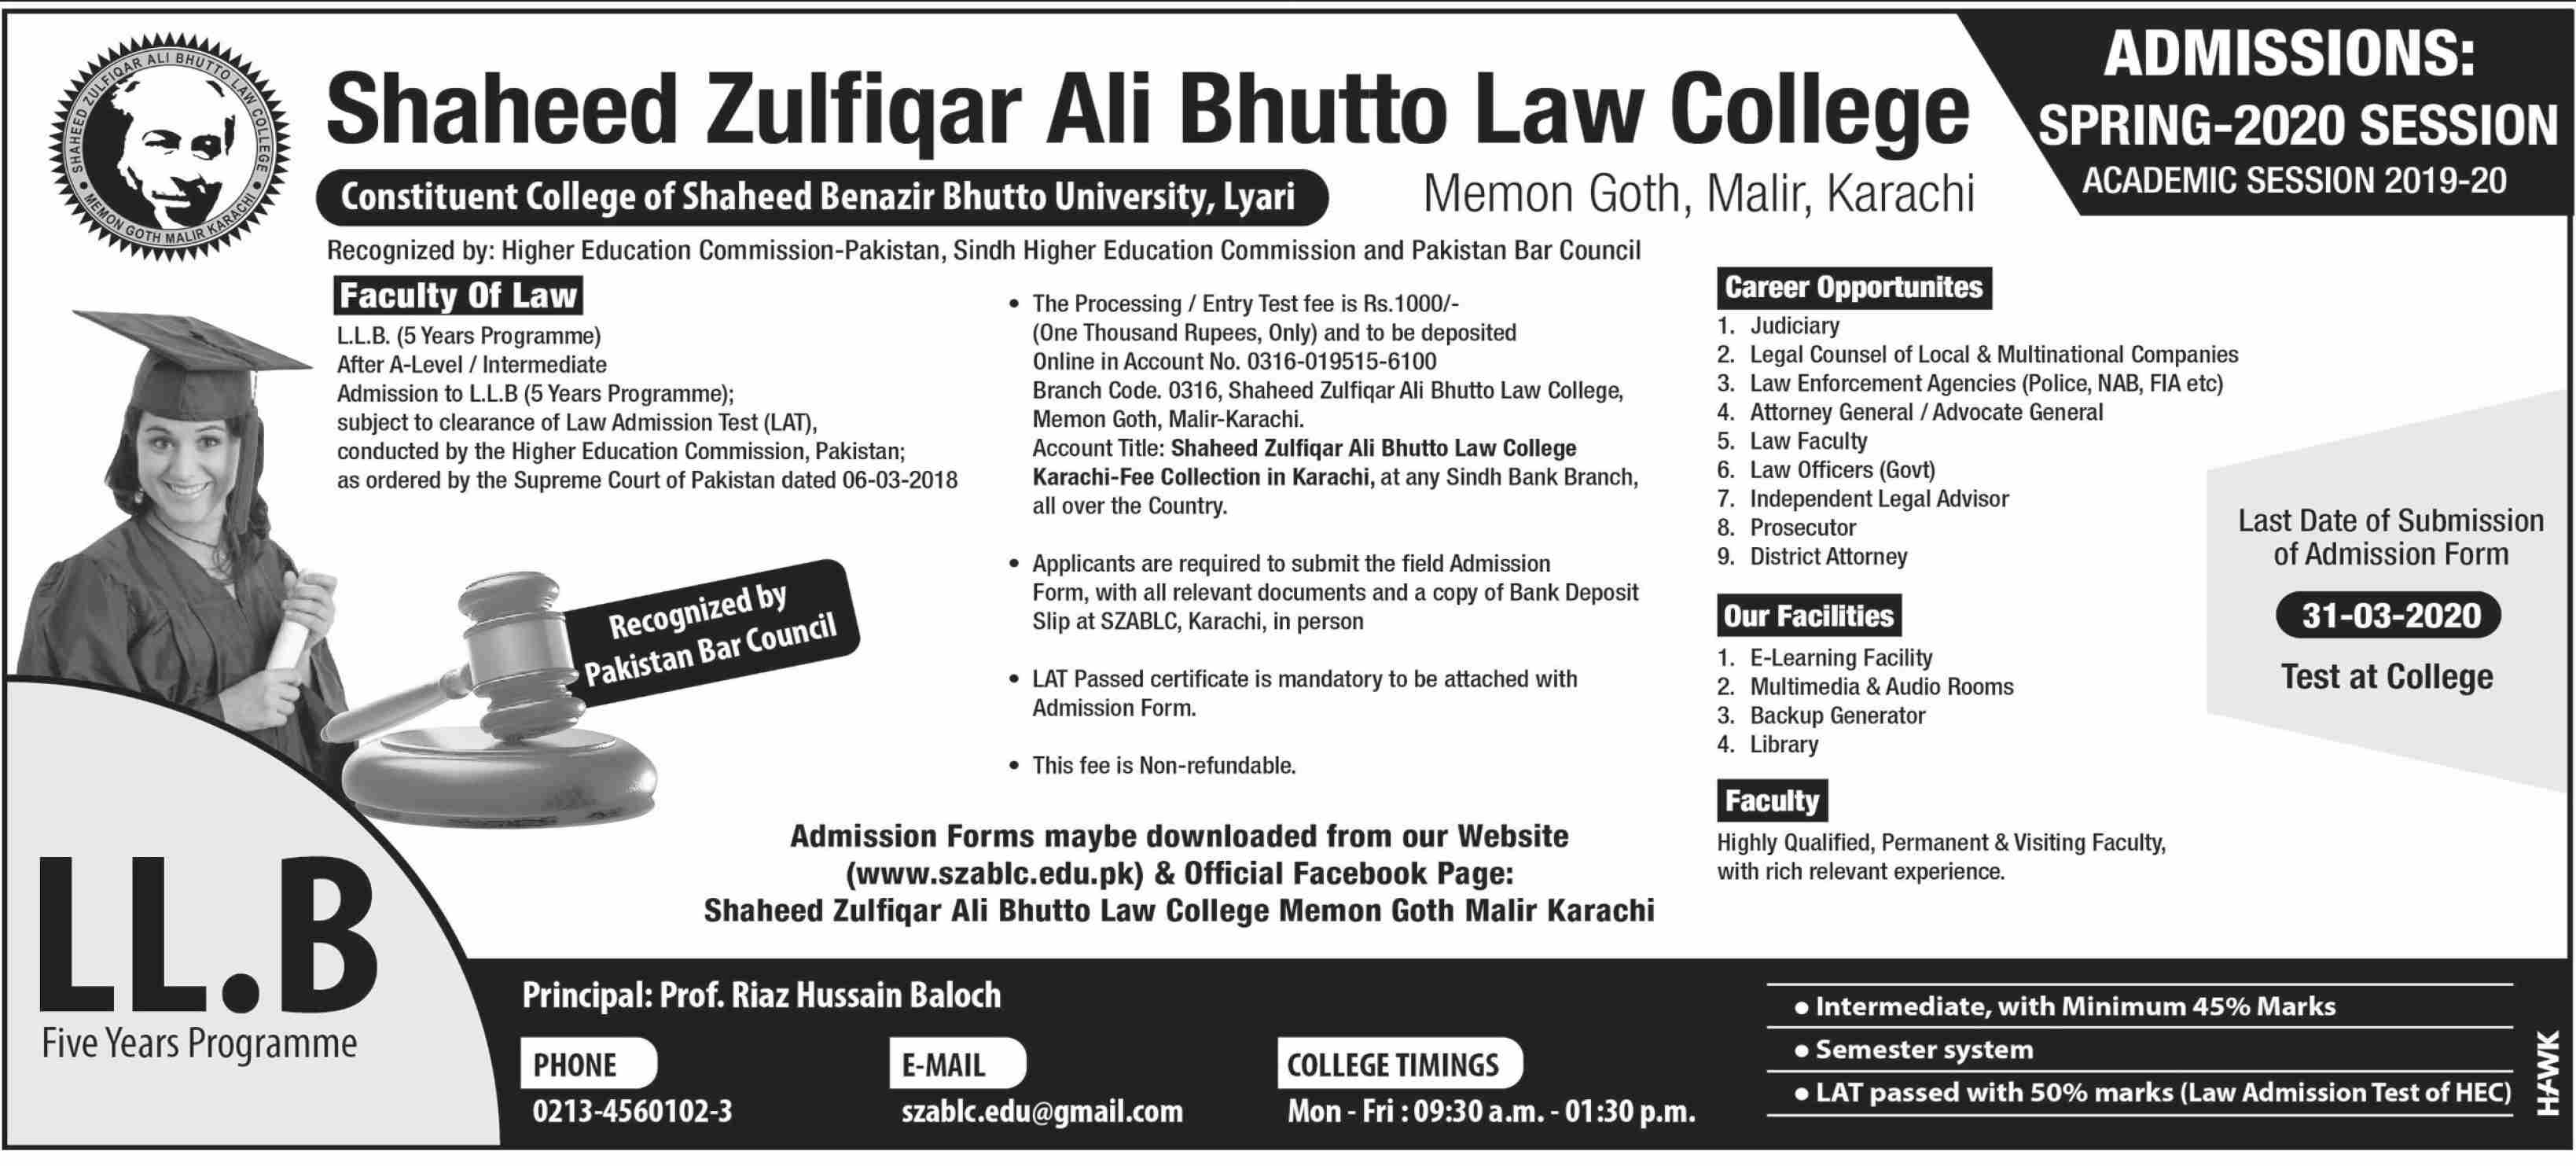 Shaheed Zulfiqar Ali Bhutto Law College Karachi Admissions